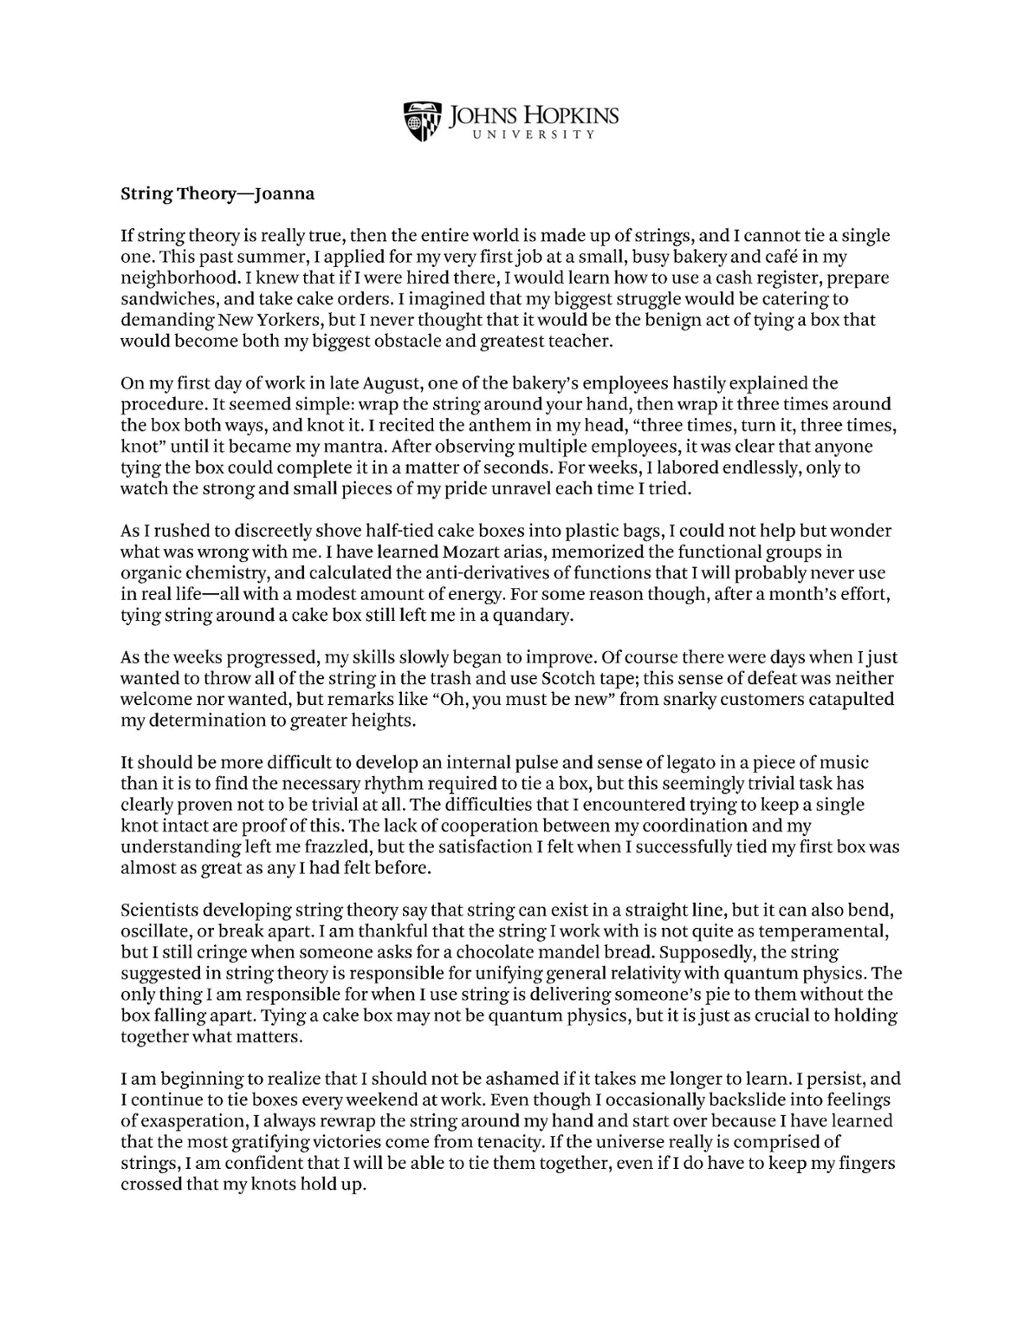 001 Jhu Essays That Worked Essay Wonderful 2019 Johns Hopkins Full